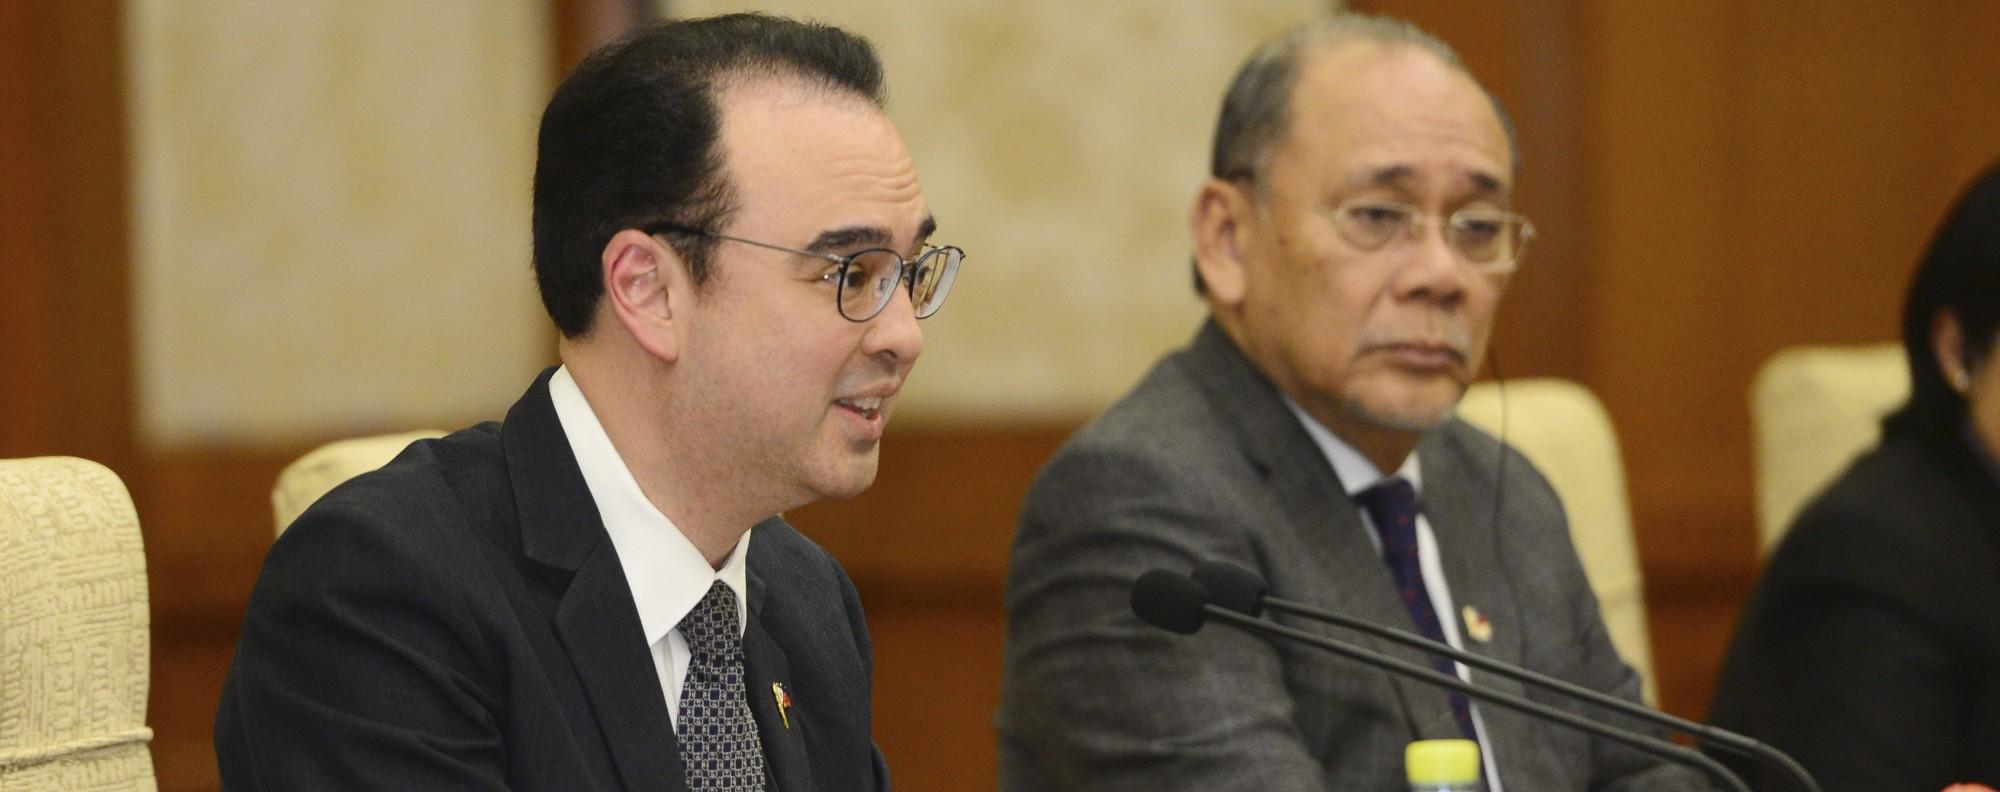 Philippine Foreign Affairs Secretary Alan Peter Cayetano, left. Photo: AP